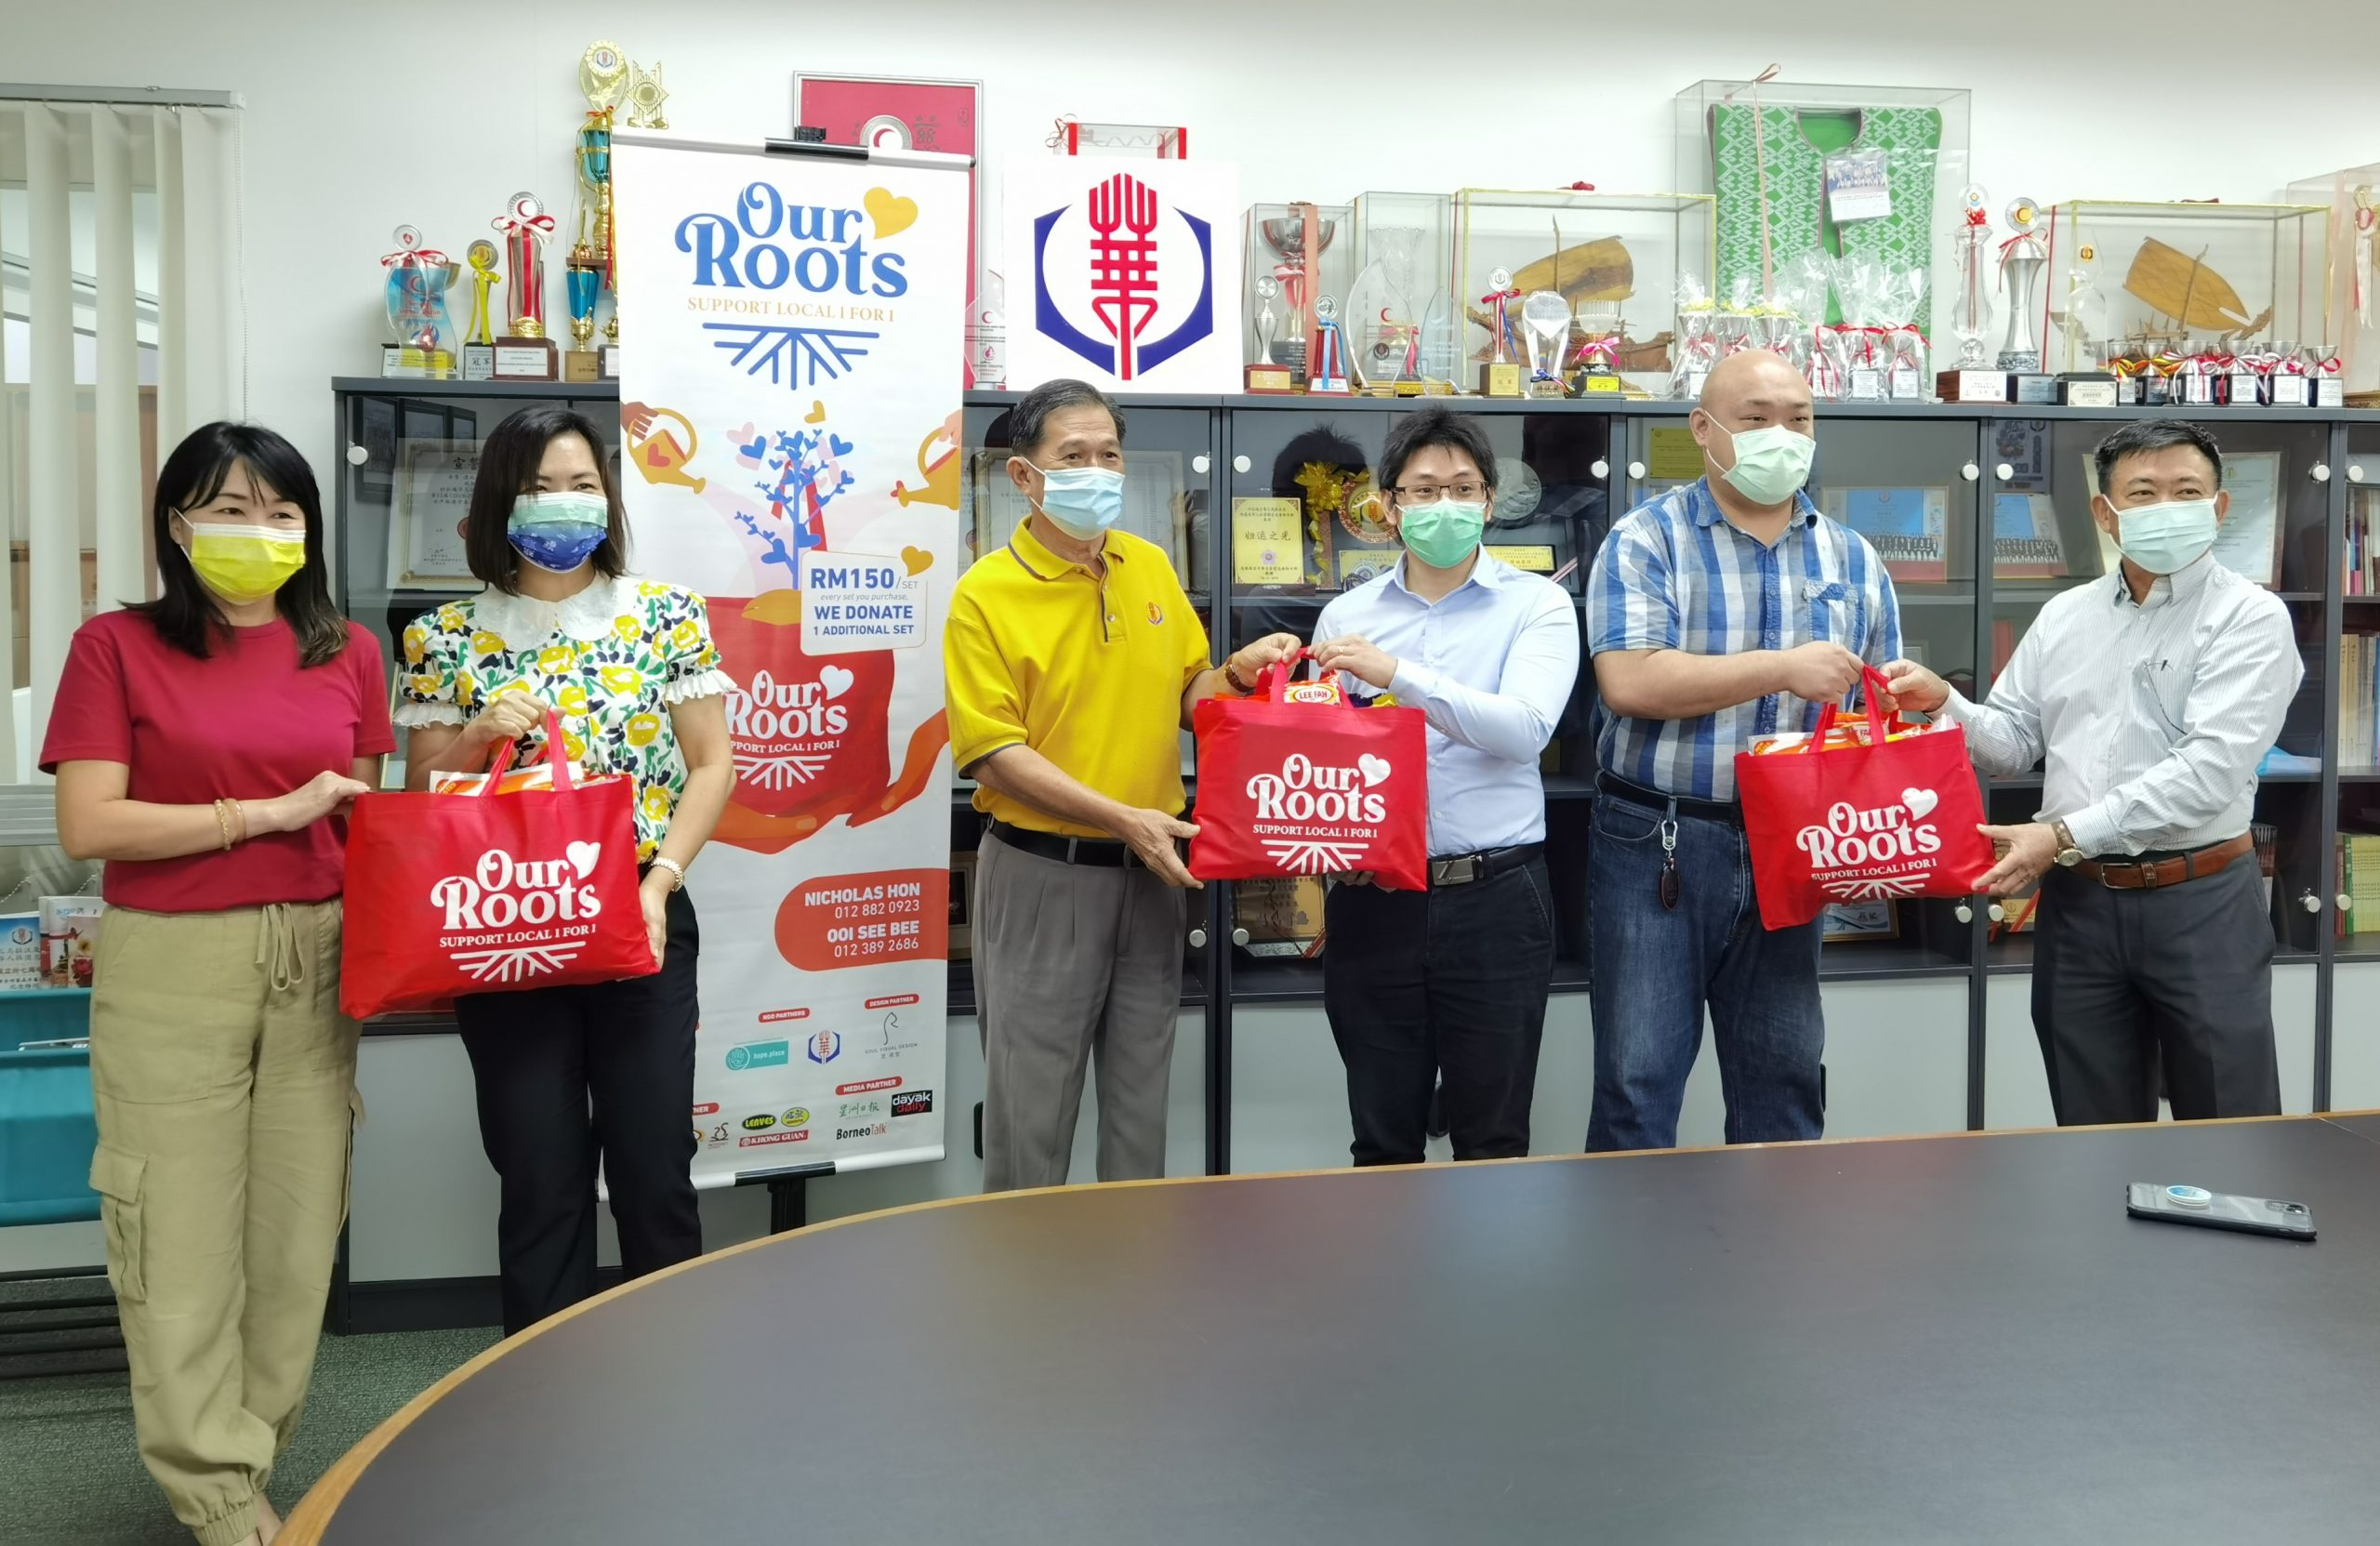 04-02-2021 Our Roots 新年福袋买一送一慈善活动,移交300份福袋予本会派送给弱势群体及贫困家庭